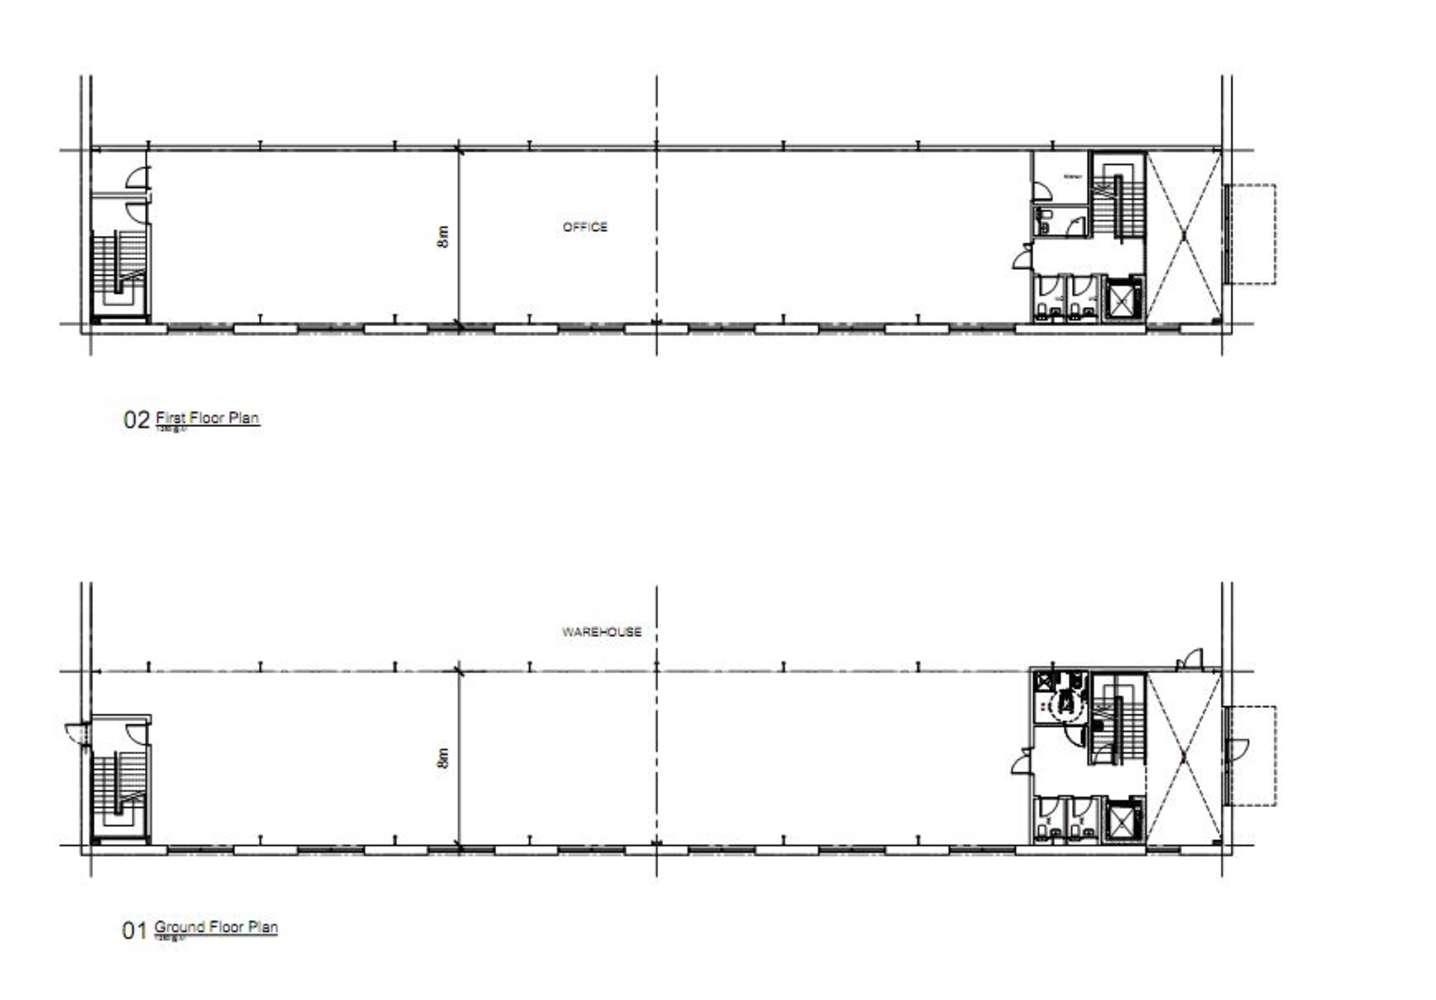 Industrial and logistics Fareham, PO15 5RJ - J9 South - 62004